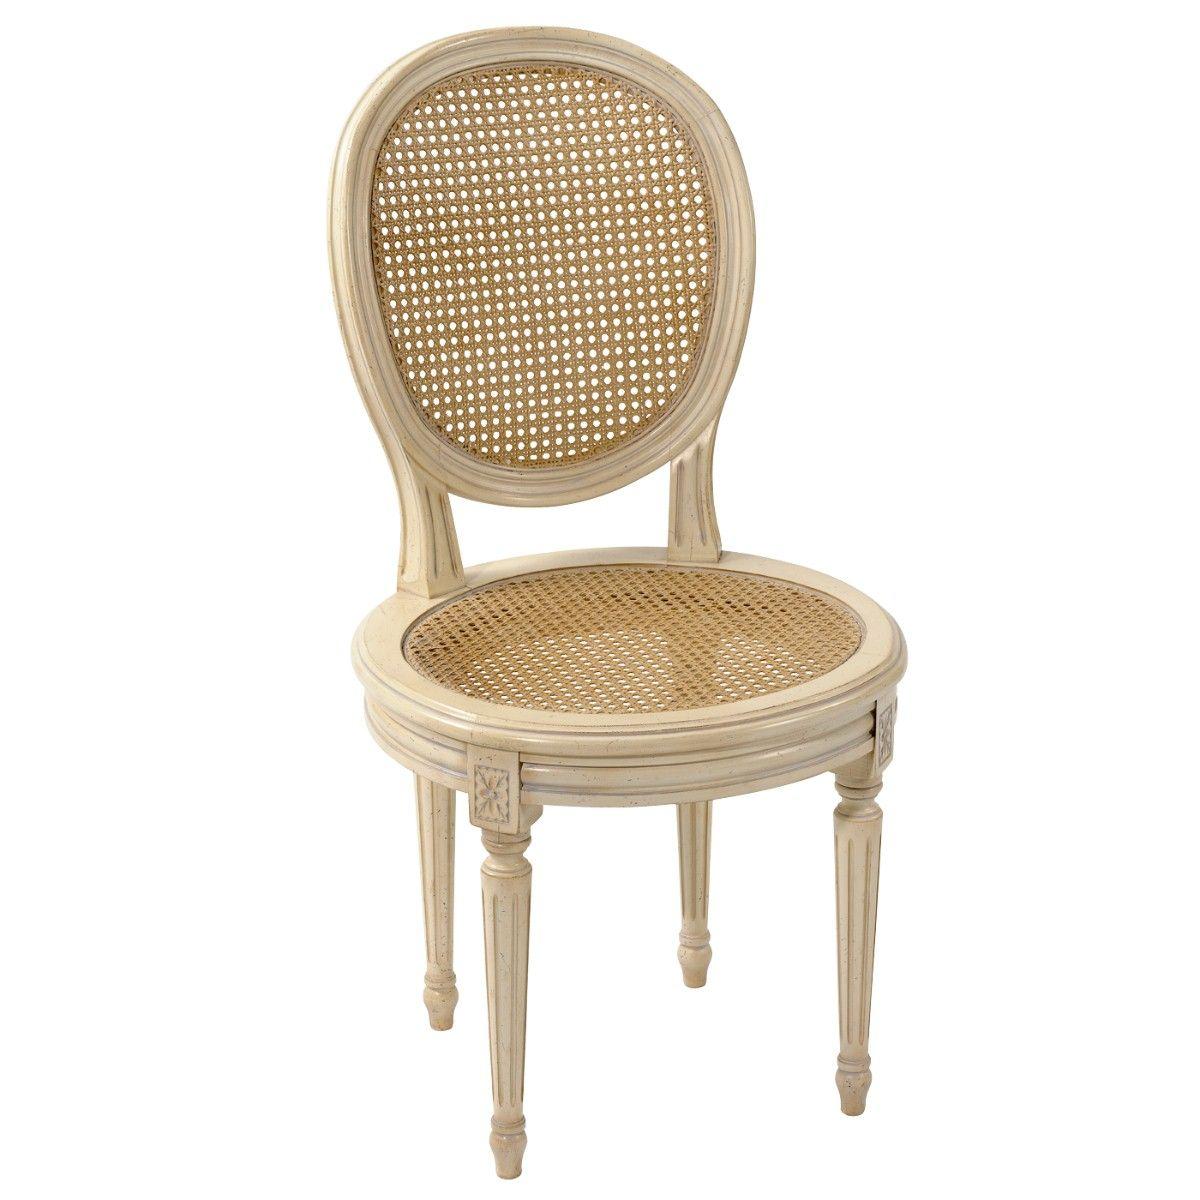 Oa035 silla rejilla sillas pinterest rejas sillas for Sillas mimbre comedor